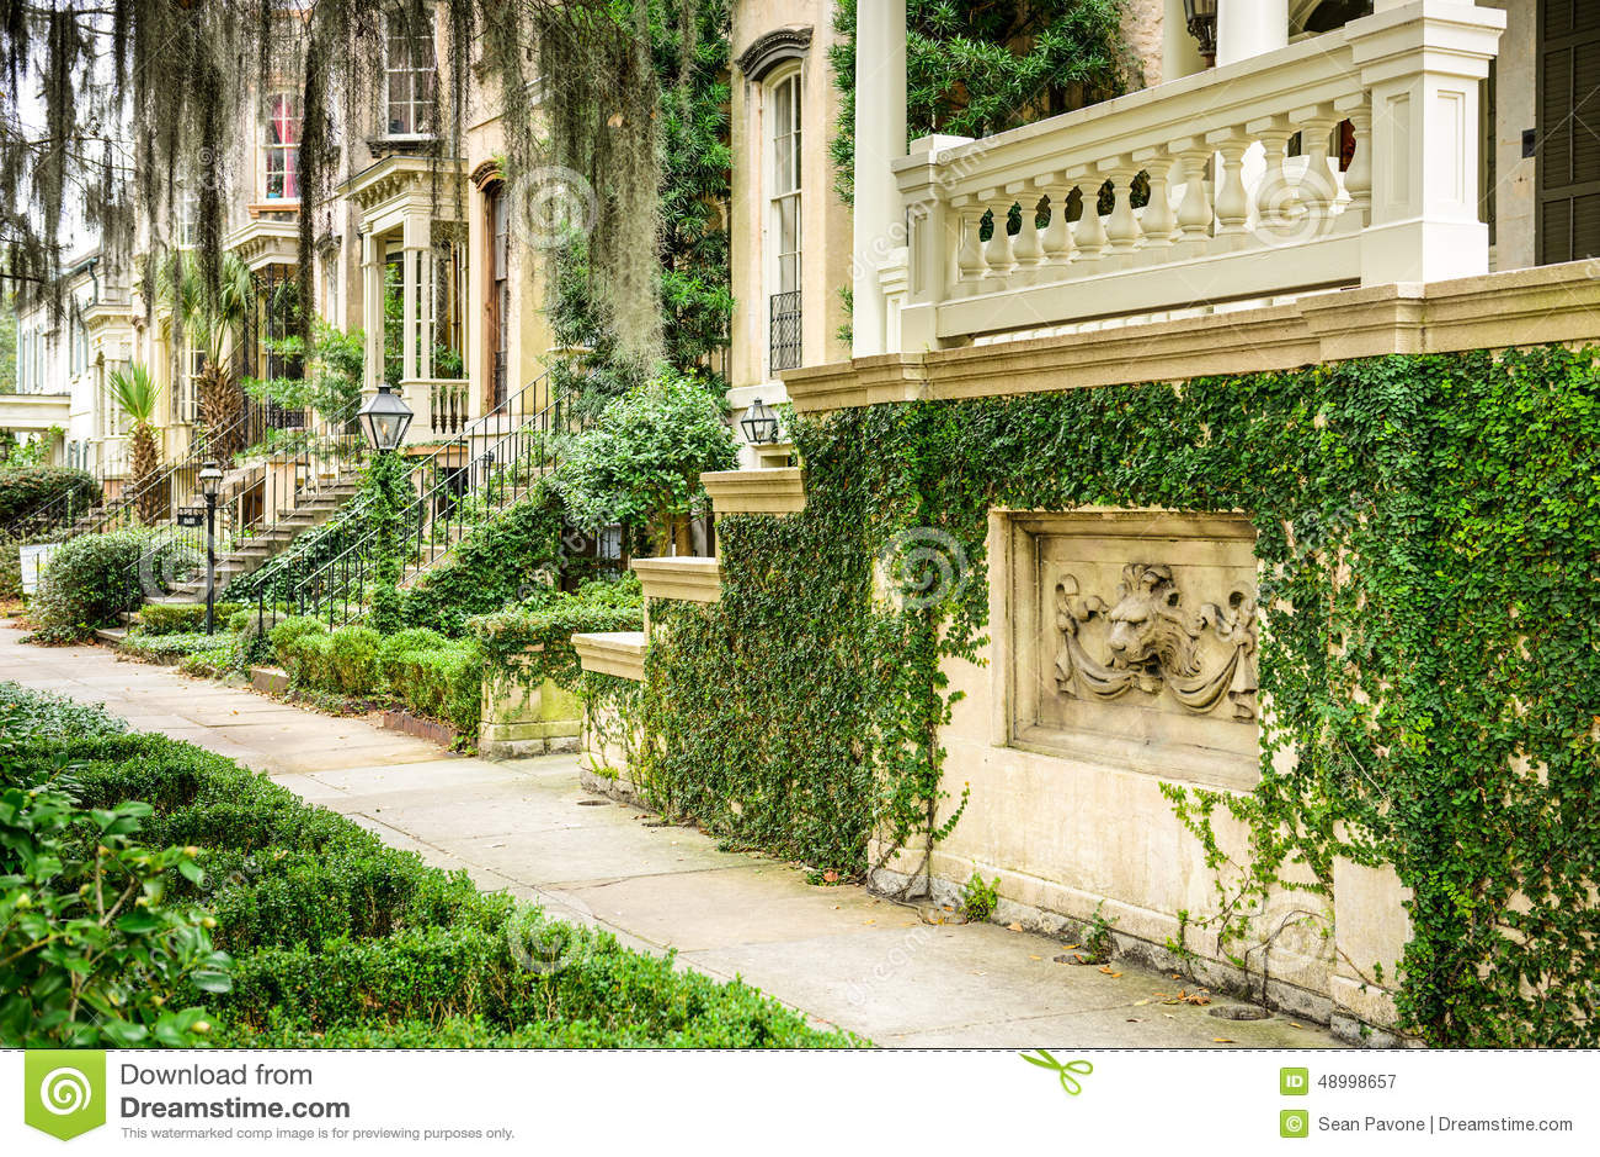 Apartments For Sale In Historic Savannah Ga